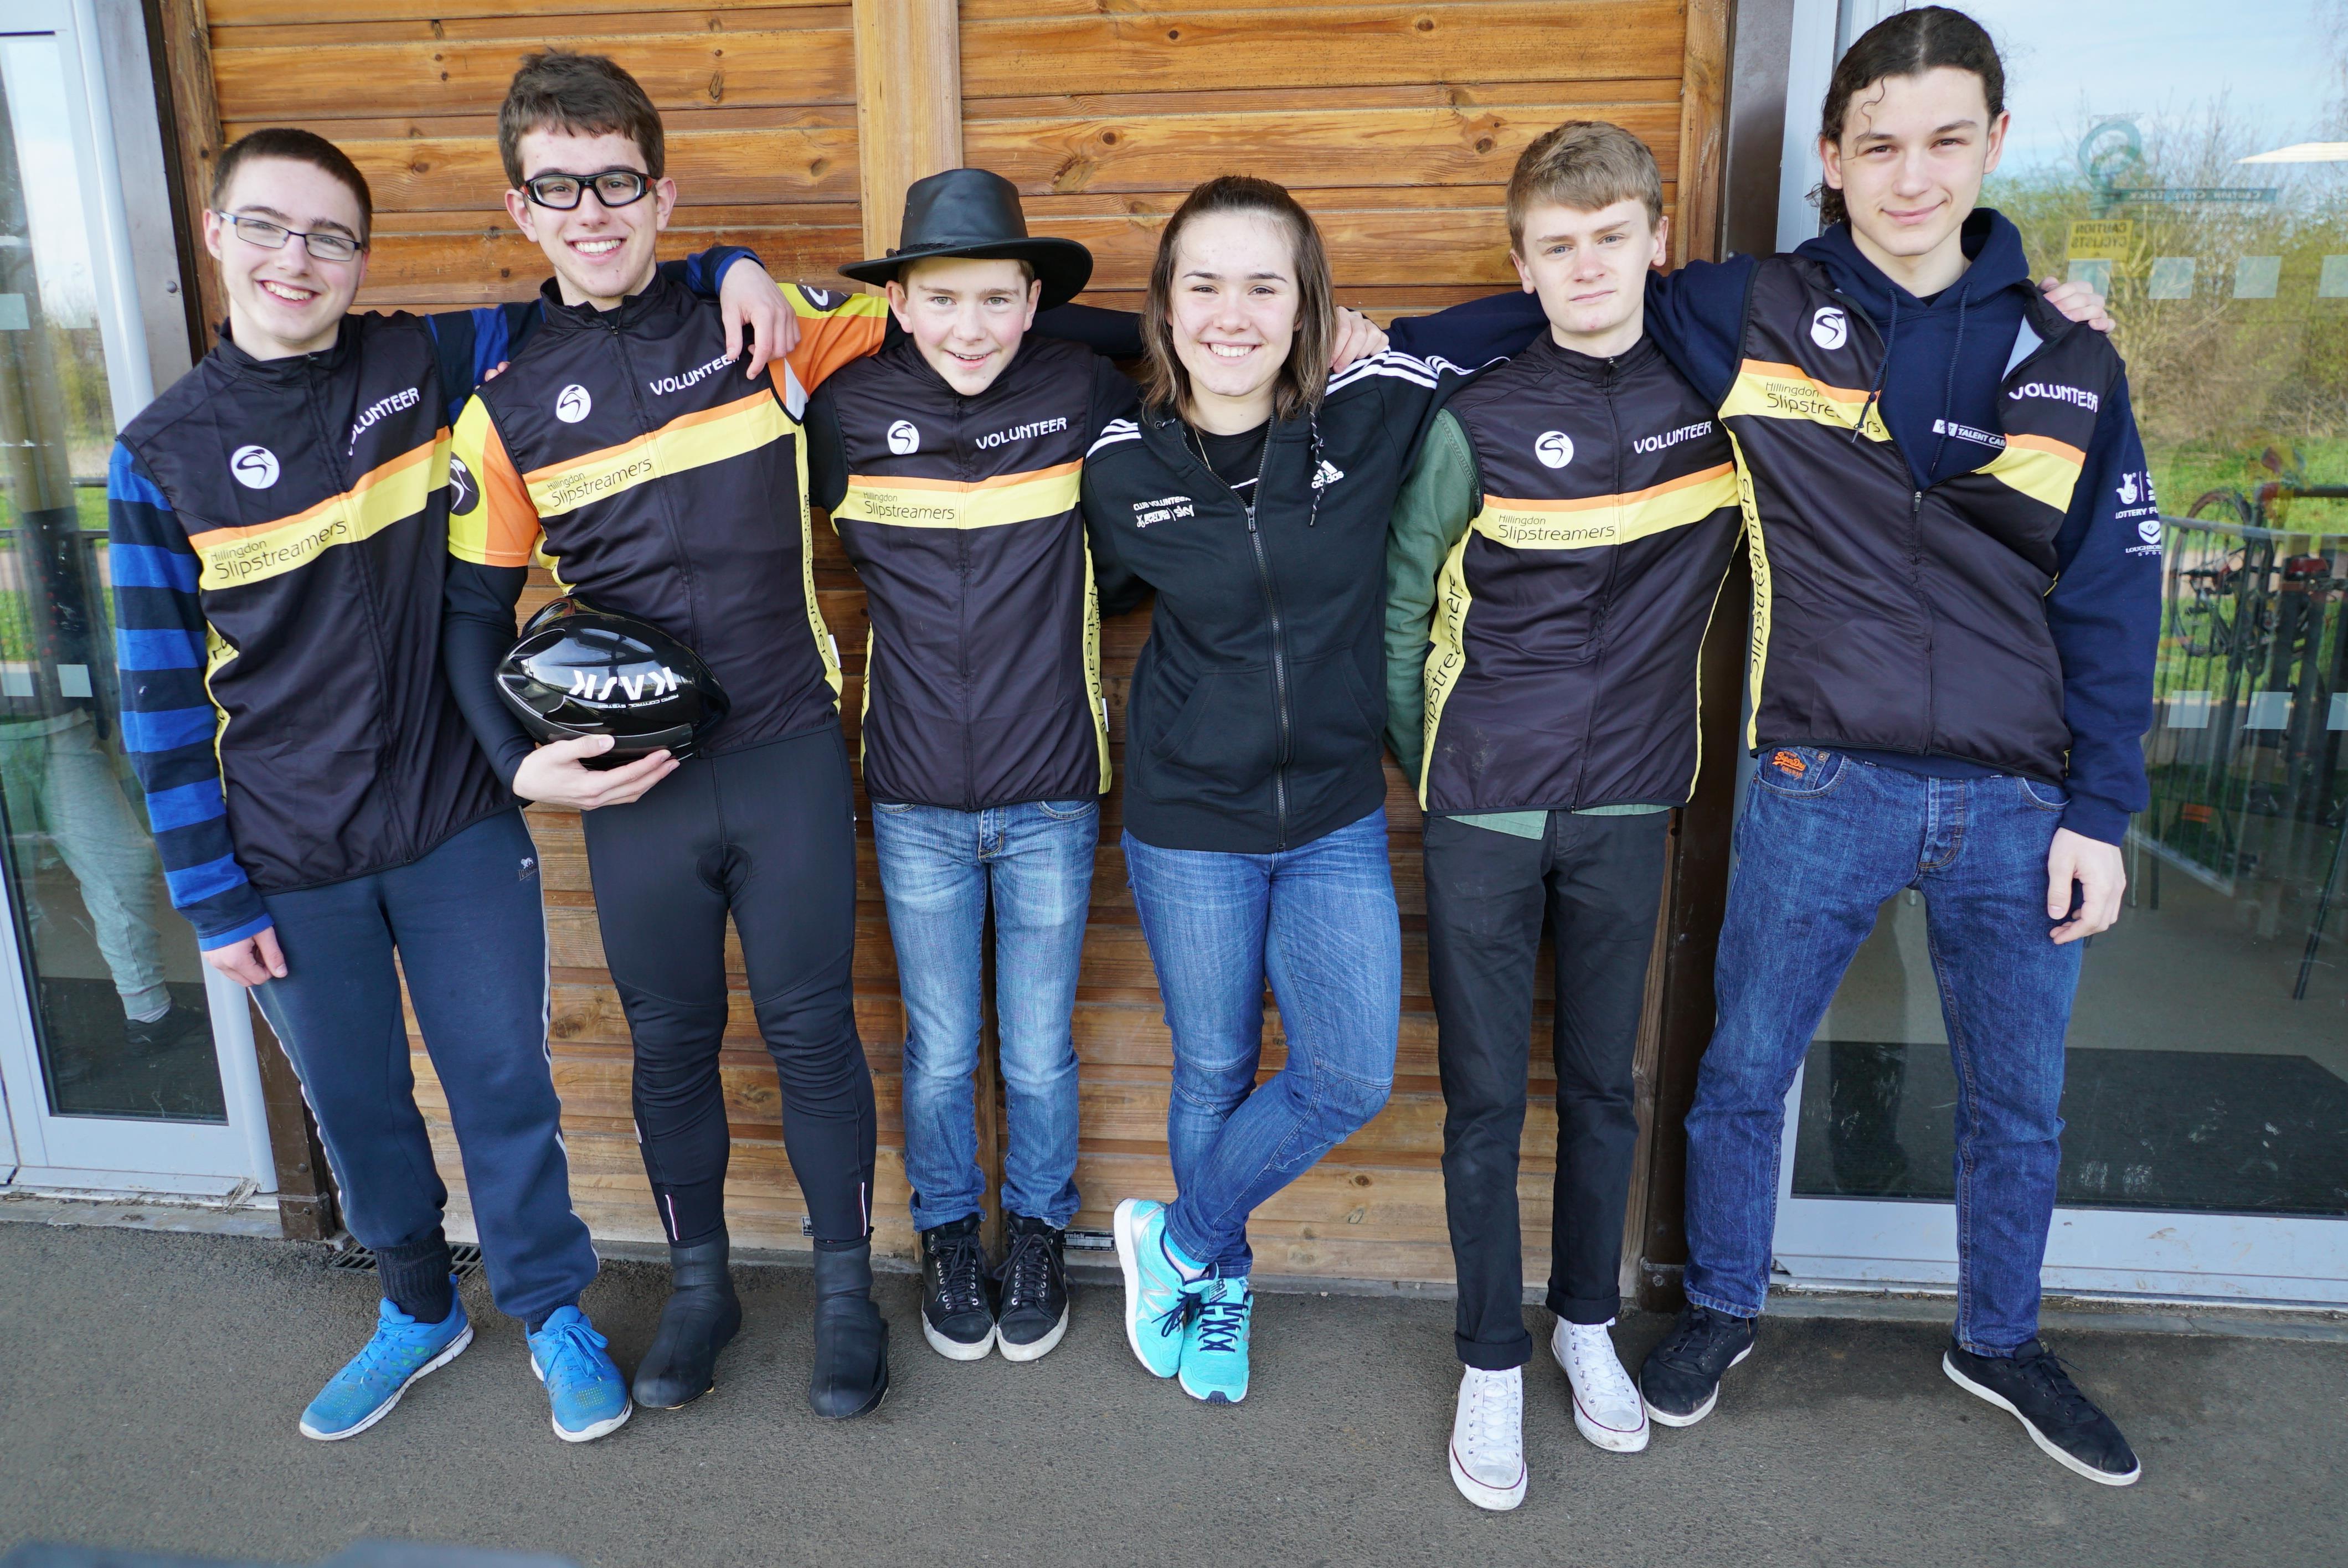 Hillingdon Slipstreamers Young Volunteers ()